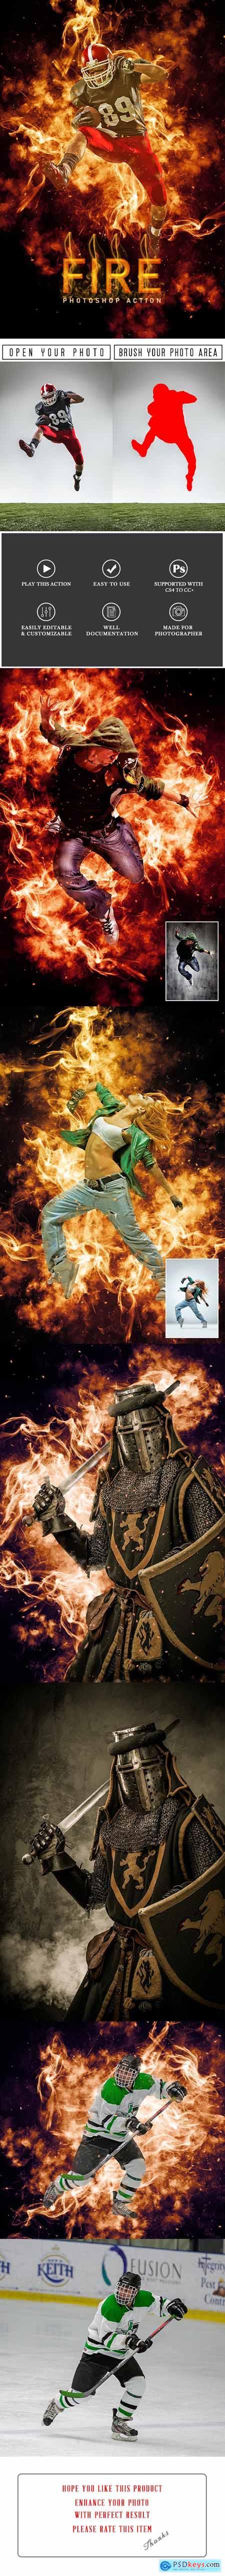 Fire Photoshop Action 29628249